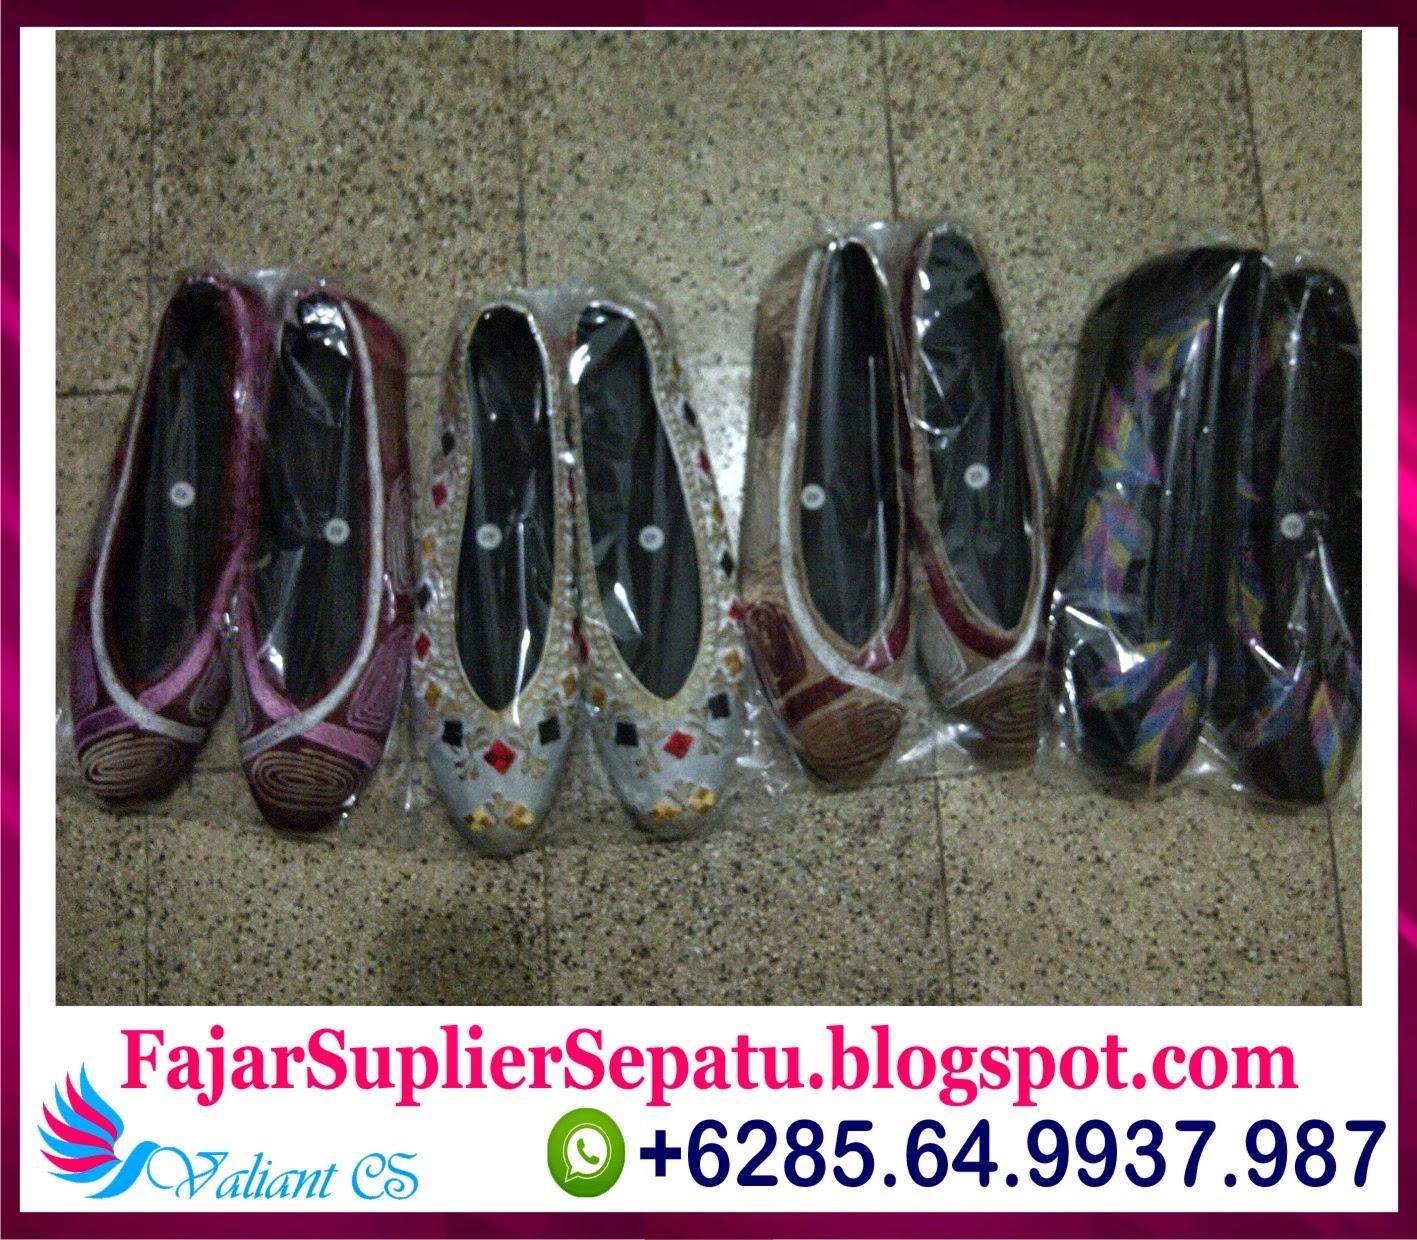 Sepatu Bordir Murah, Grosir Sepatu Bordir Malang, Grosir Sepatu Bordir Jakarta, +62.8564.993.7987